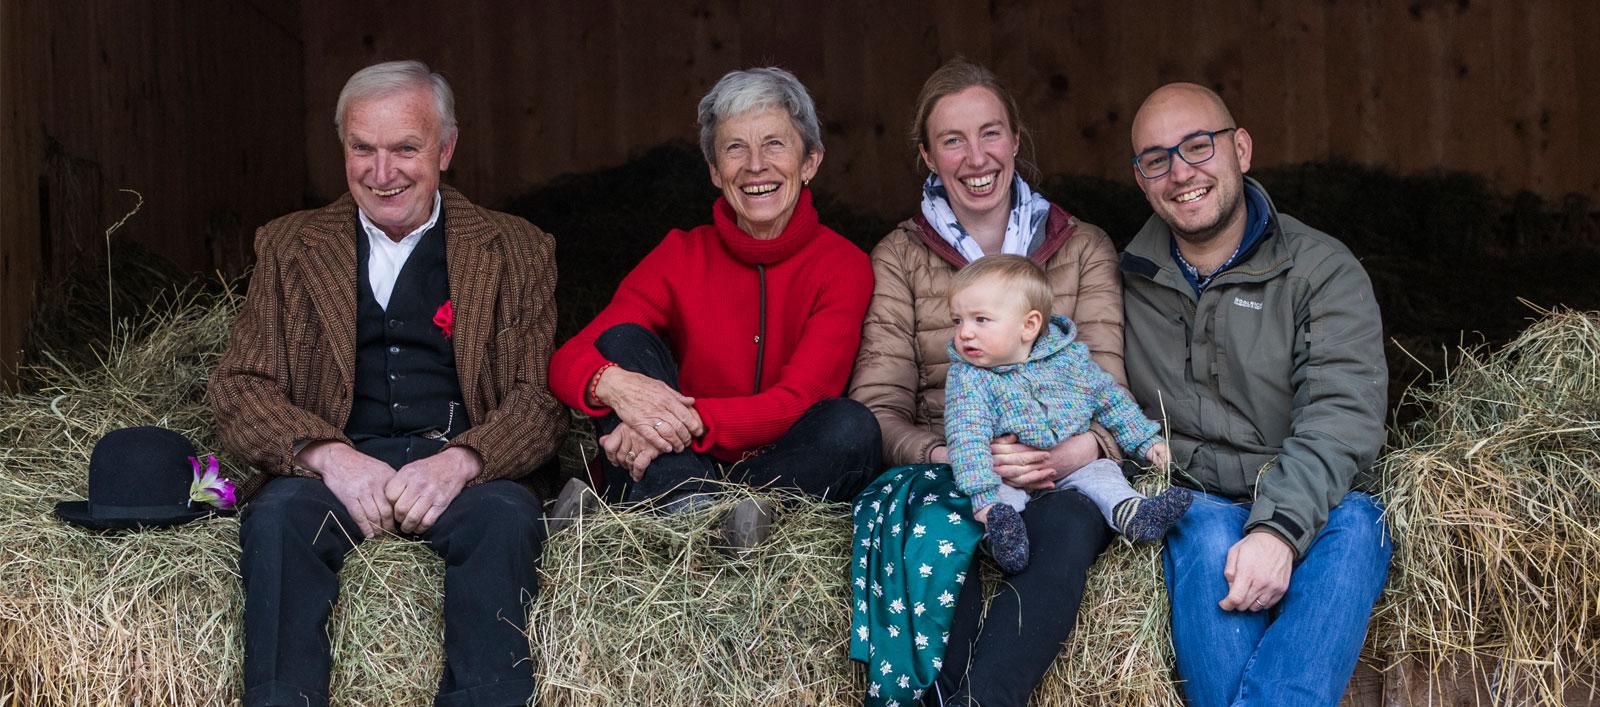 Famiglia Brunel Agriturismo Biologico Ciasa dò Parè in Val di Fassa